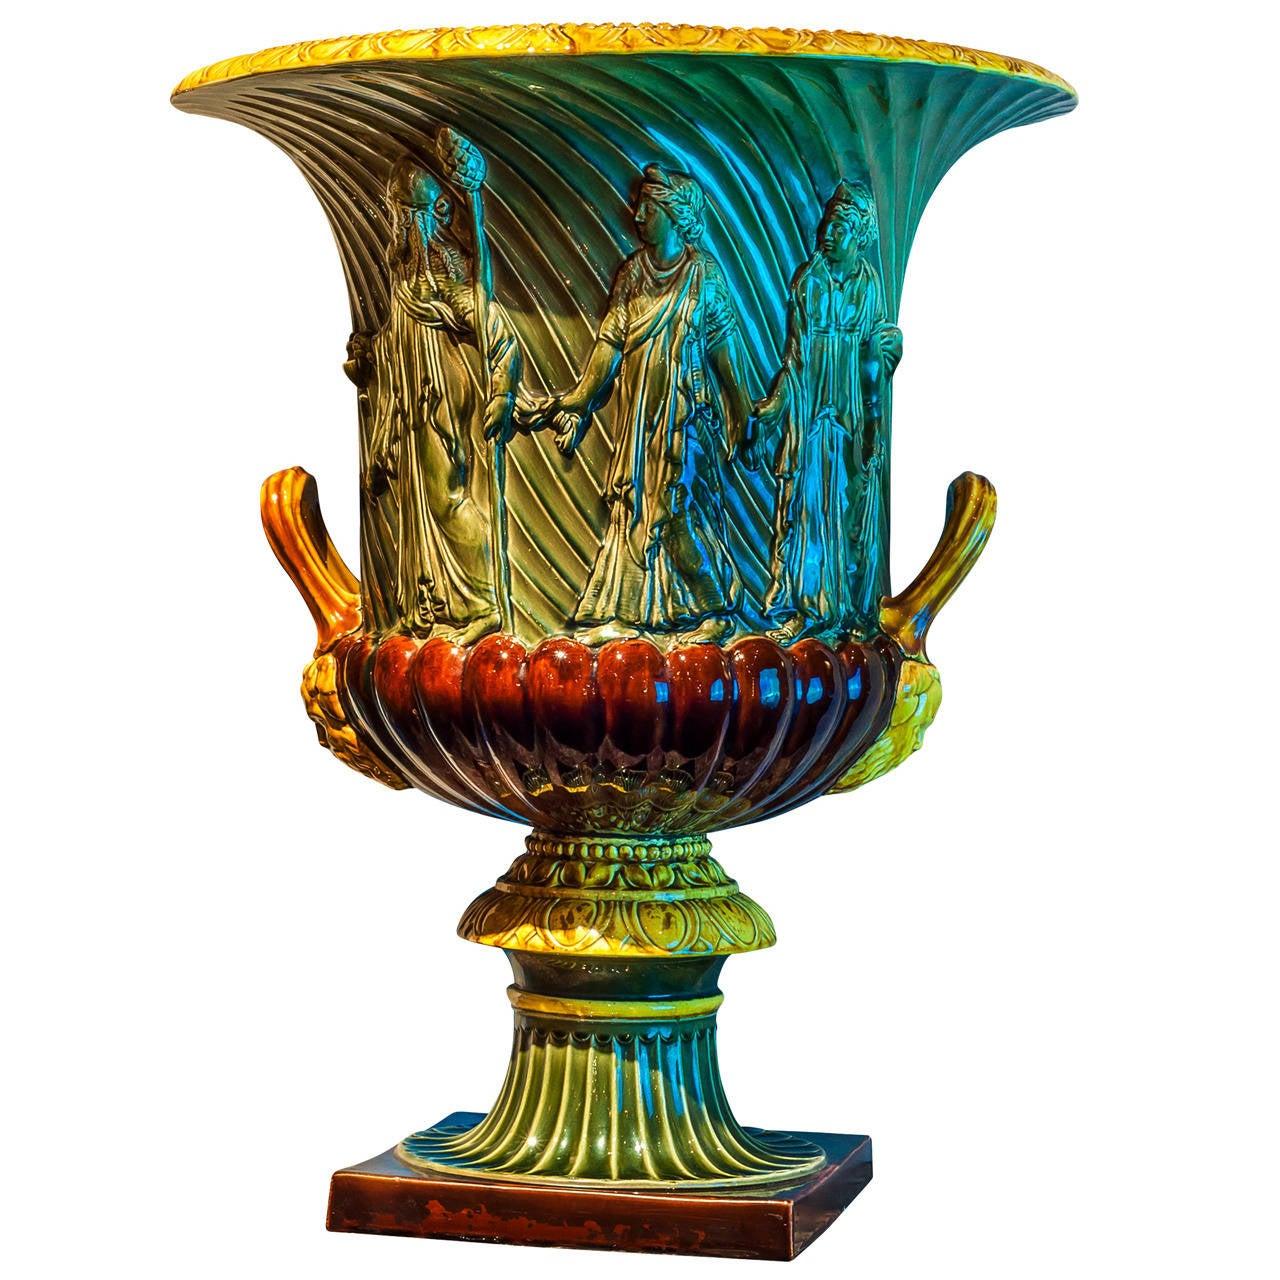 Majolica campana form neoclassical jardiniere vase for Jardiniere decorative